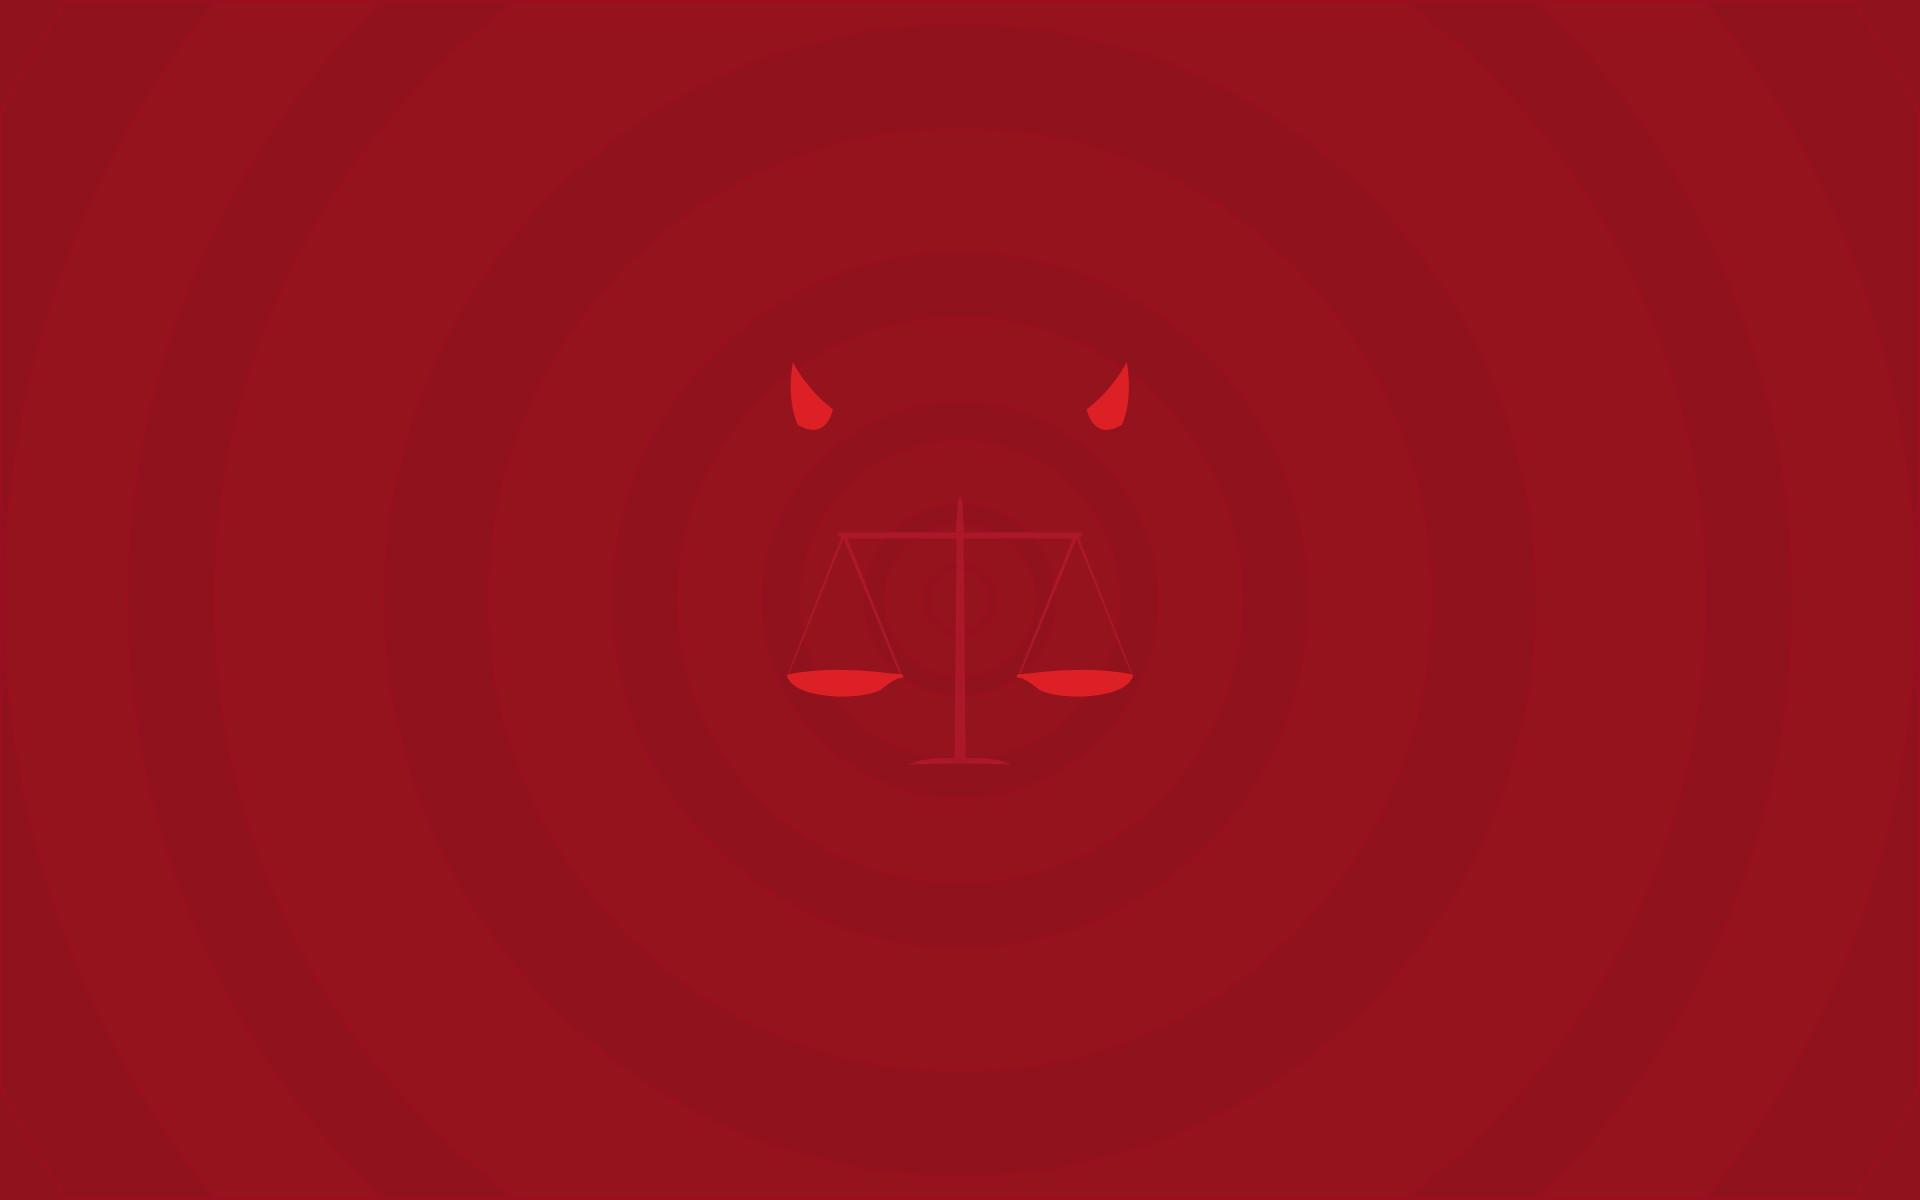 Comics – Daredevil Wallpaper